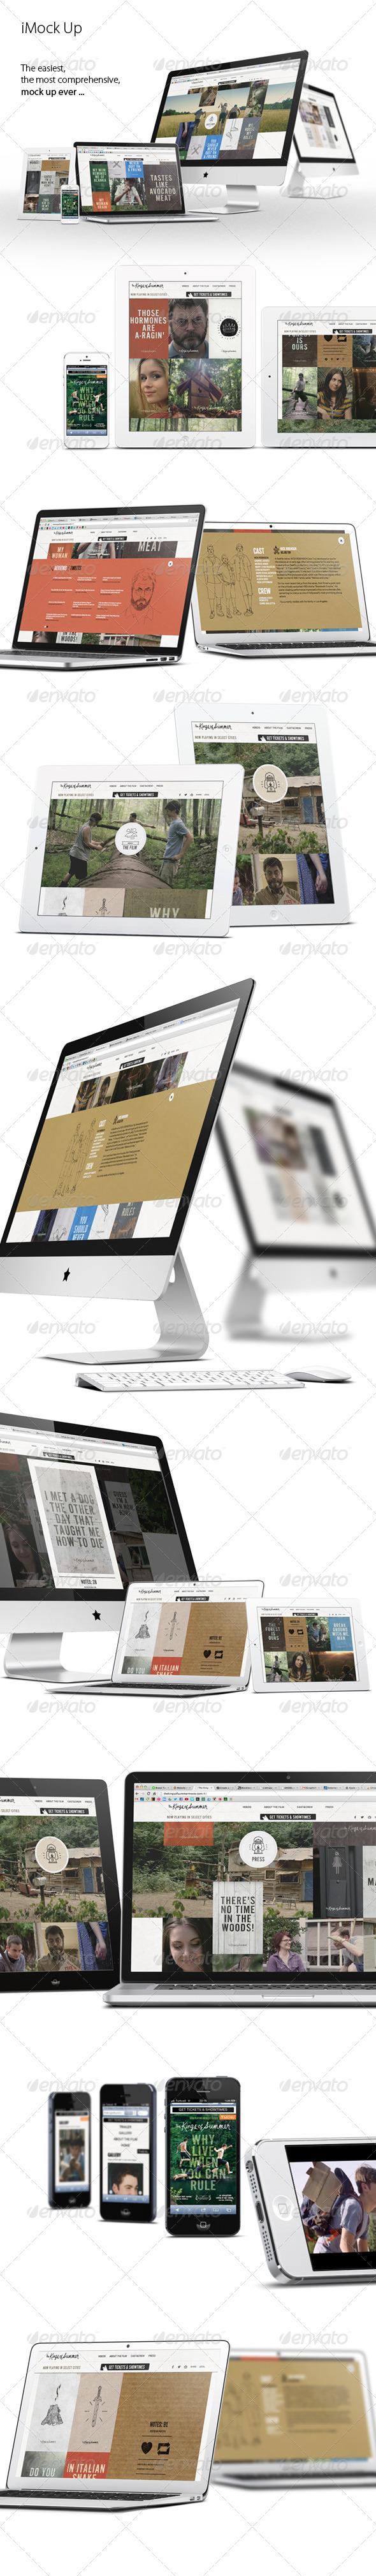 GraphicRiver iMock Up v6 5108489